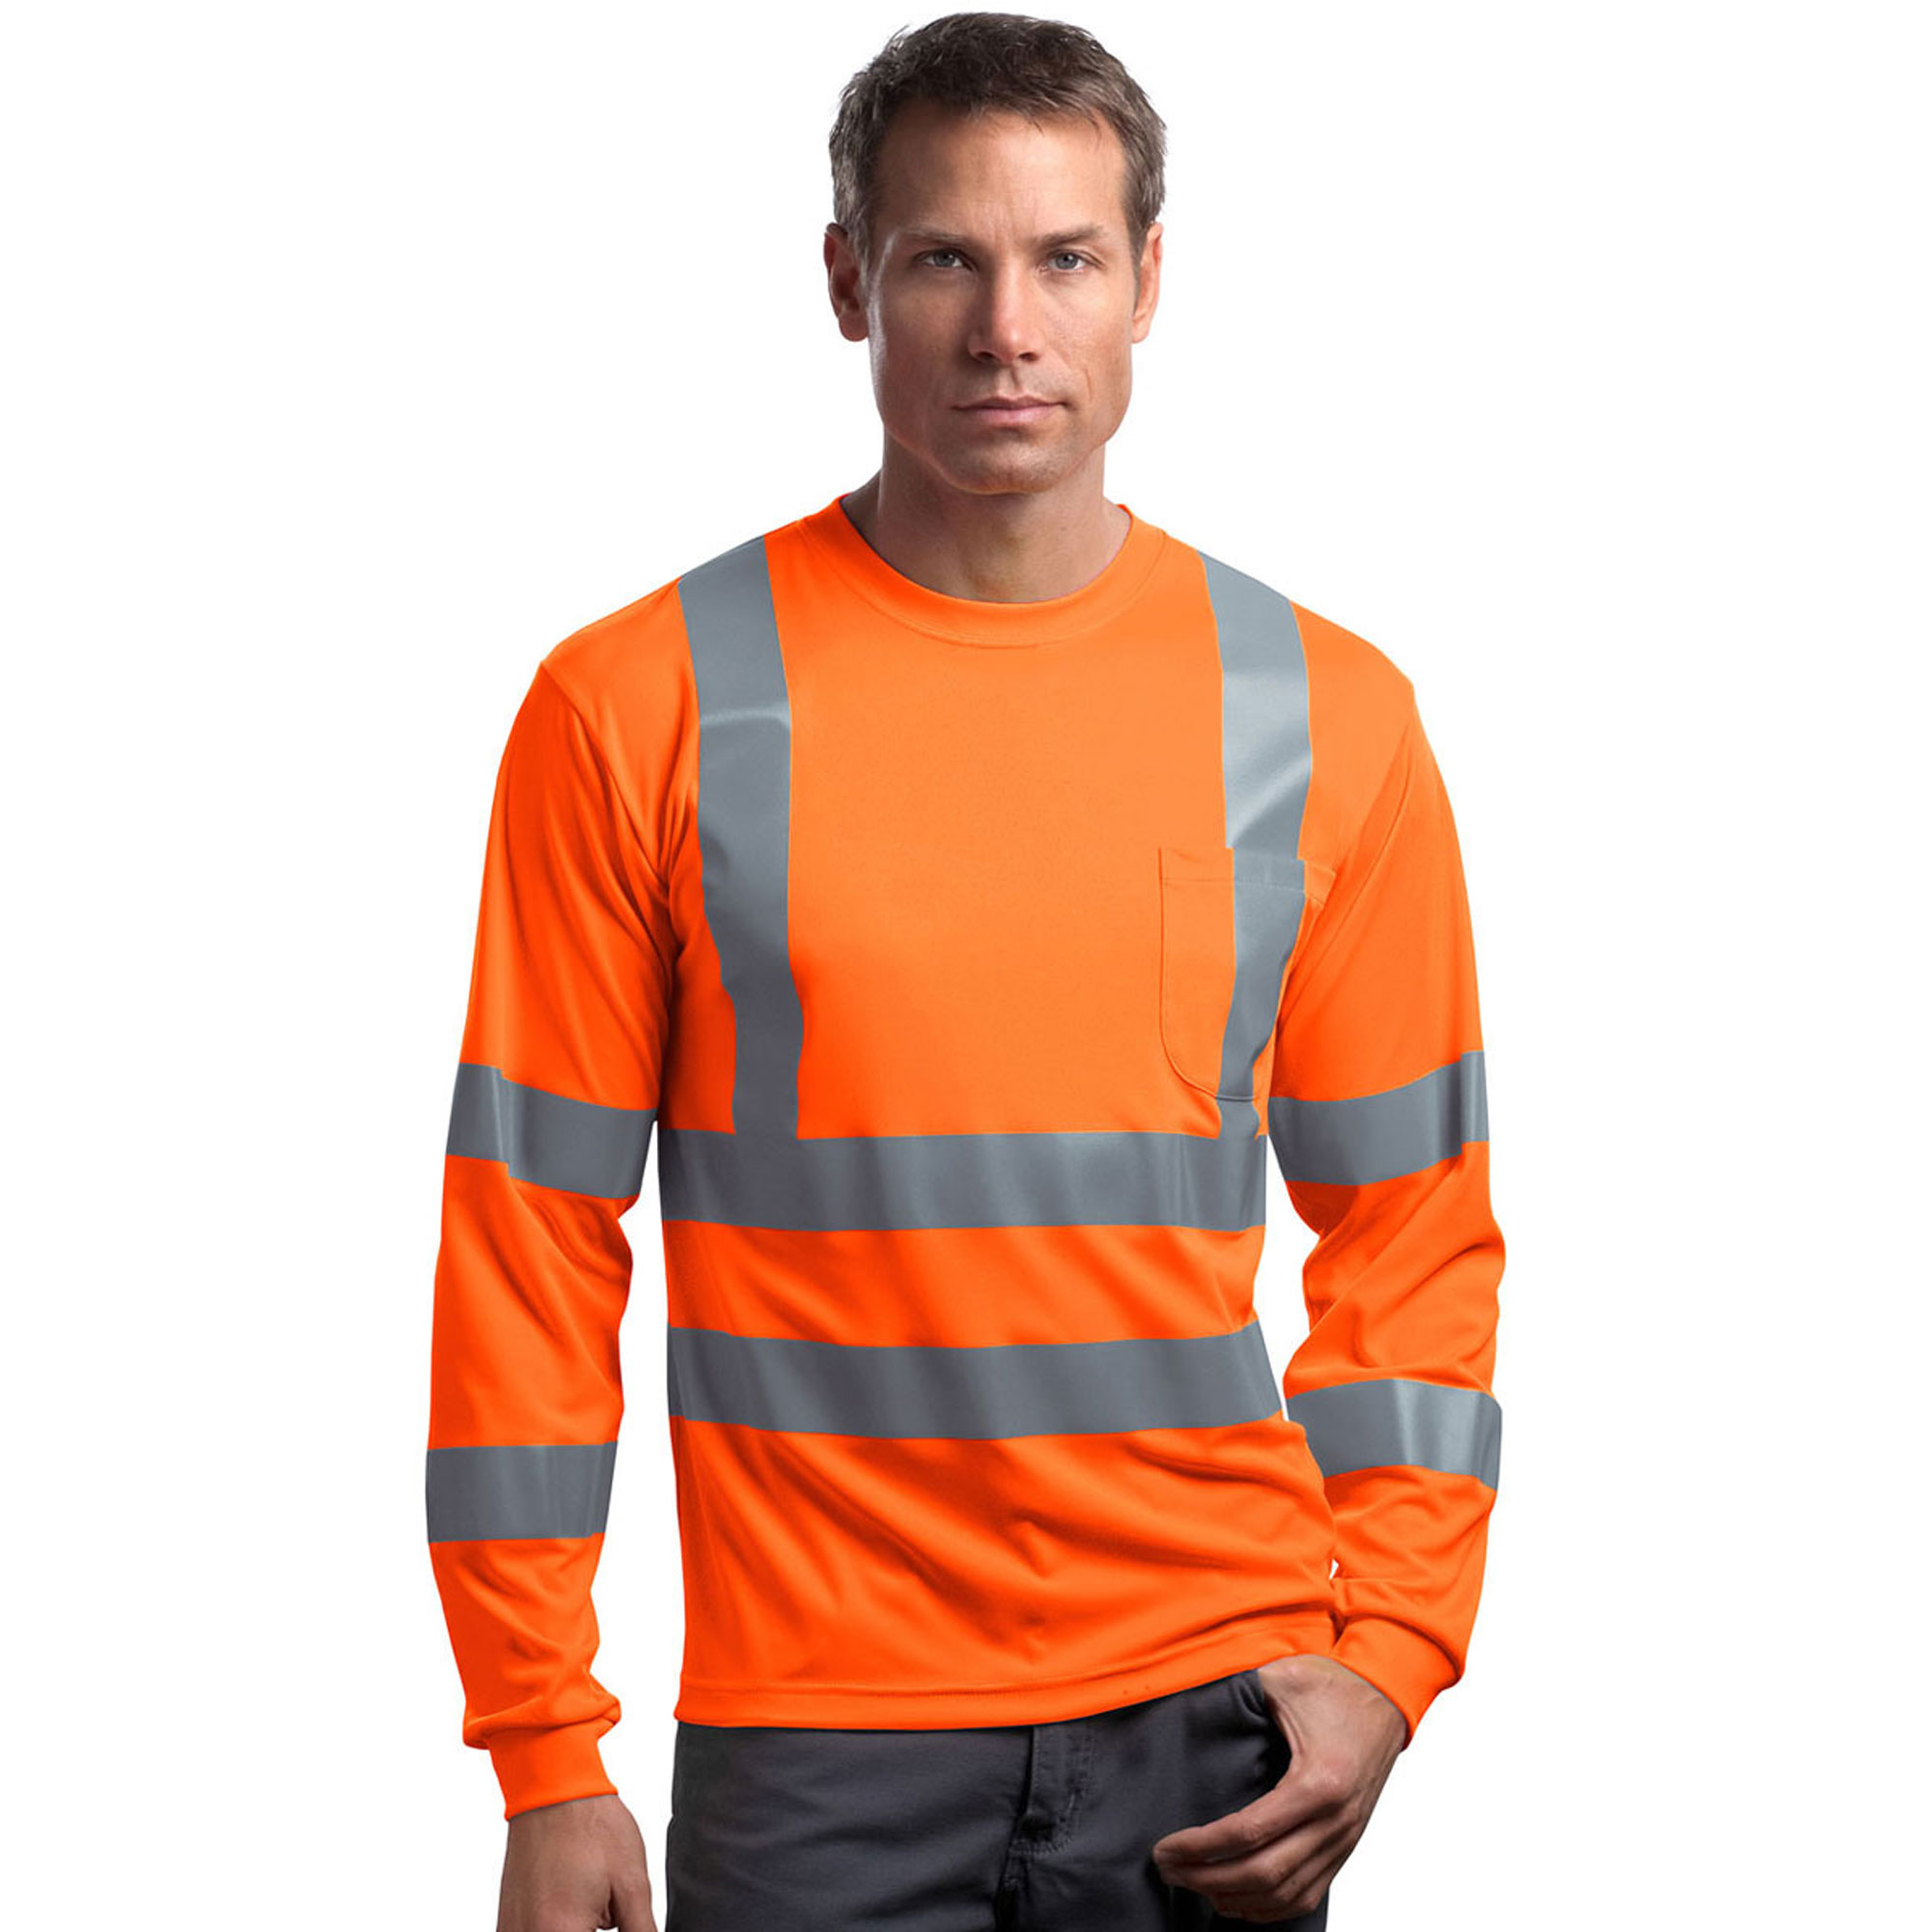 Cornerstone Men's Long Sleeve Reflective Crewneck T-Shirt